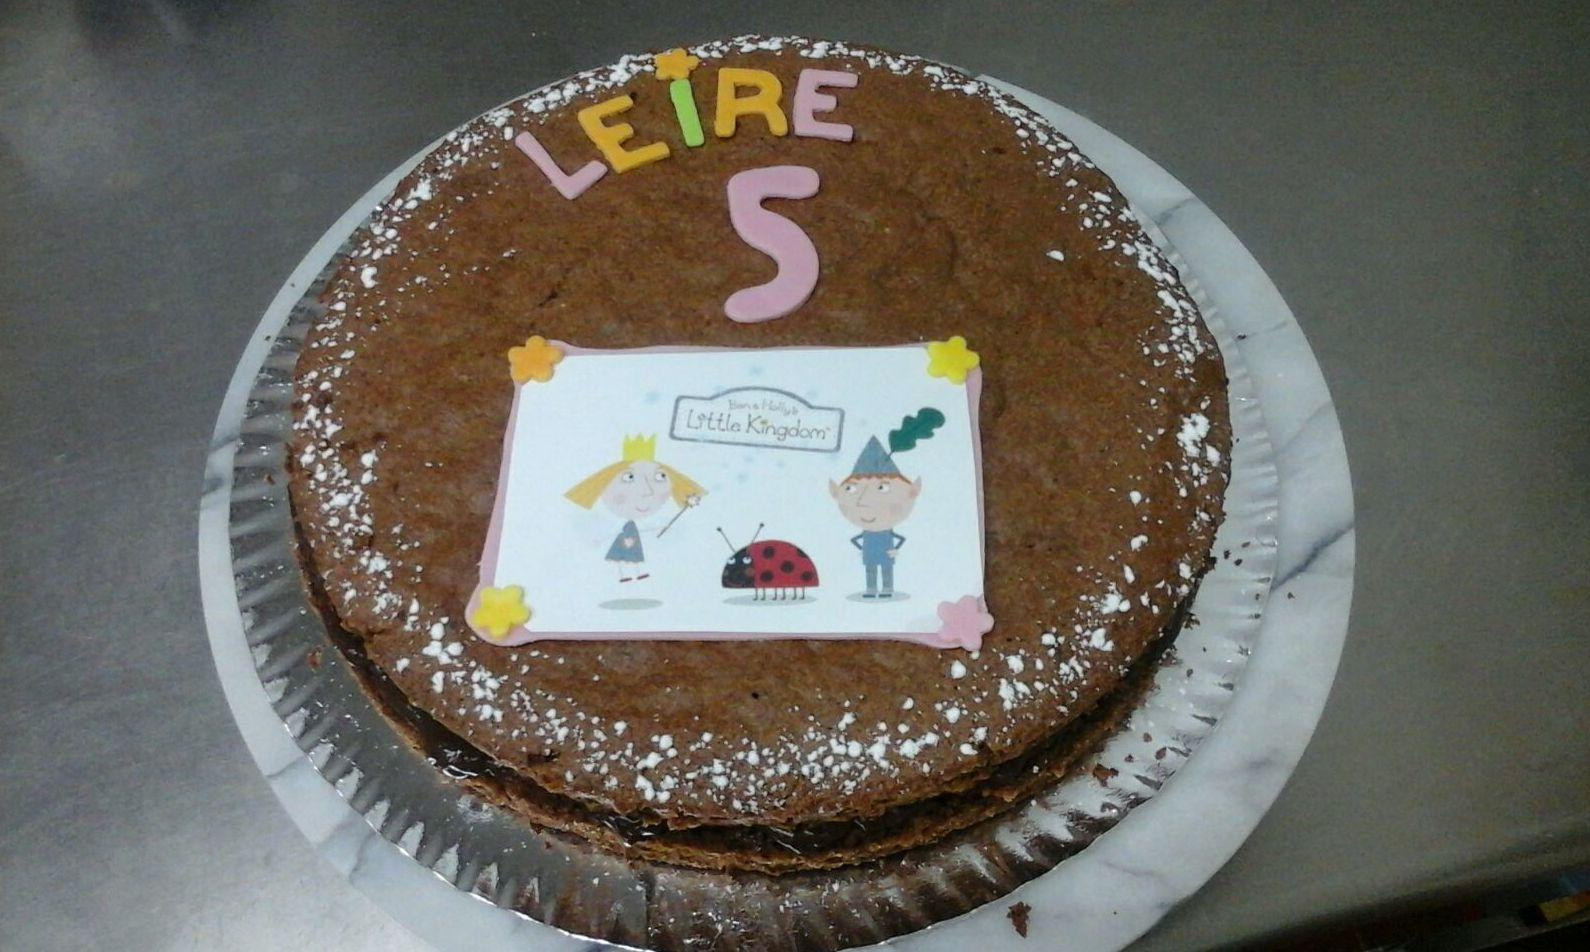 Tarta de cumpleaños para Leire